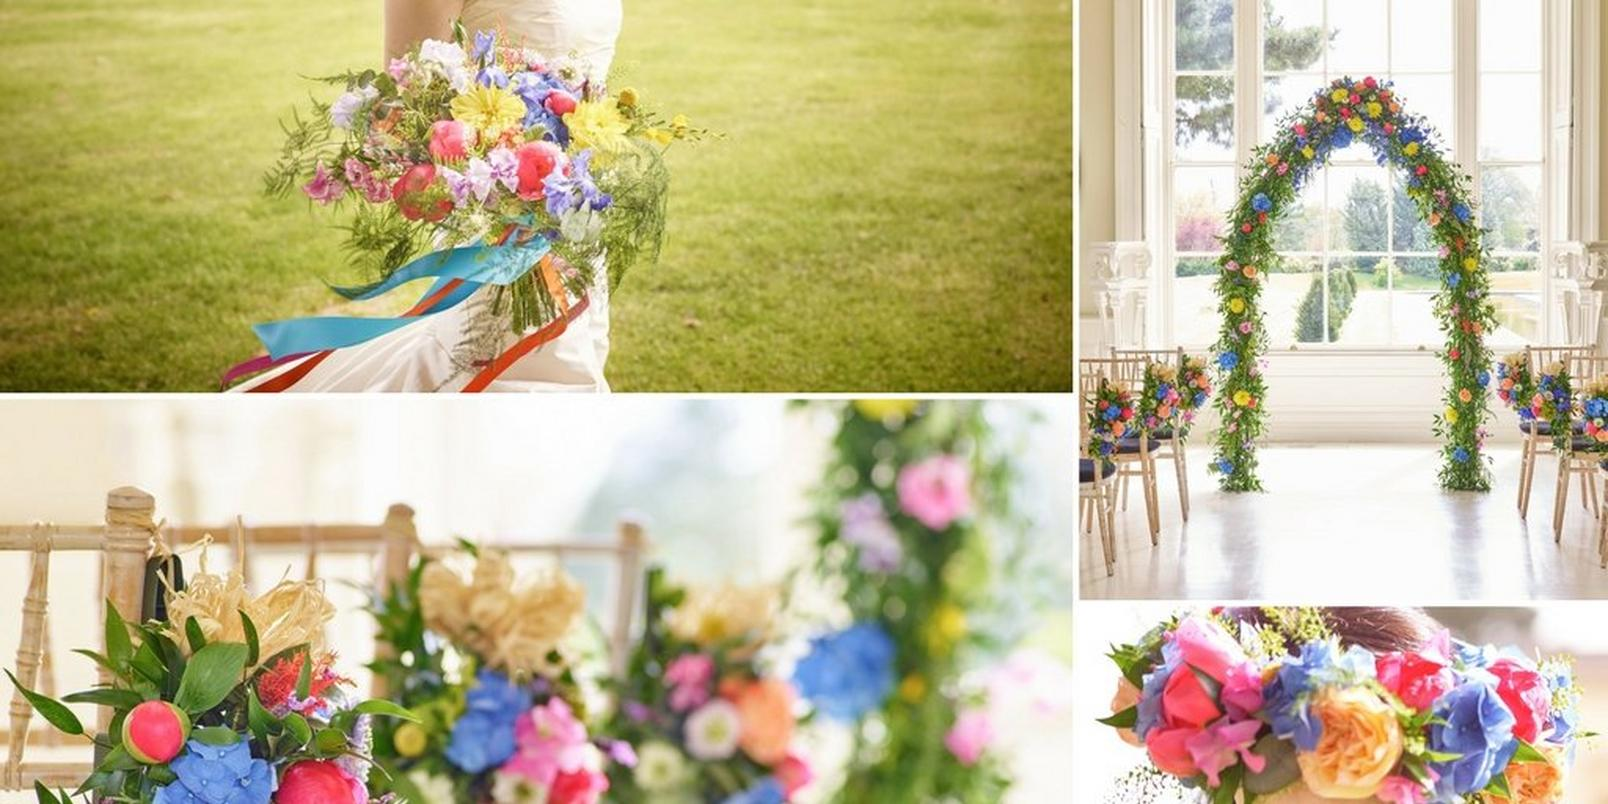 4_Untitled-design-3-summer-wedding-ideas